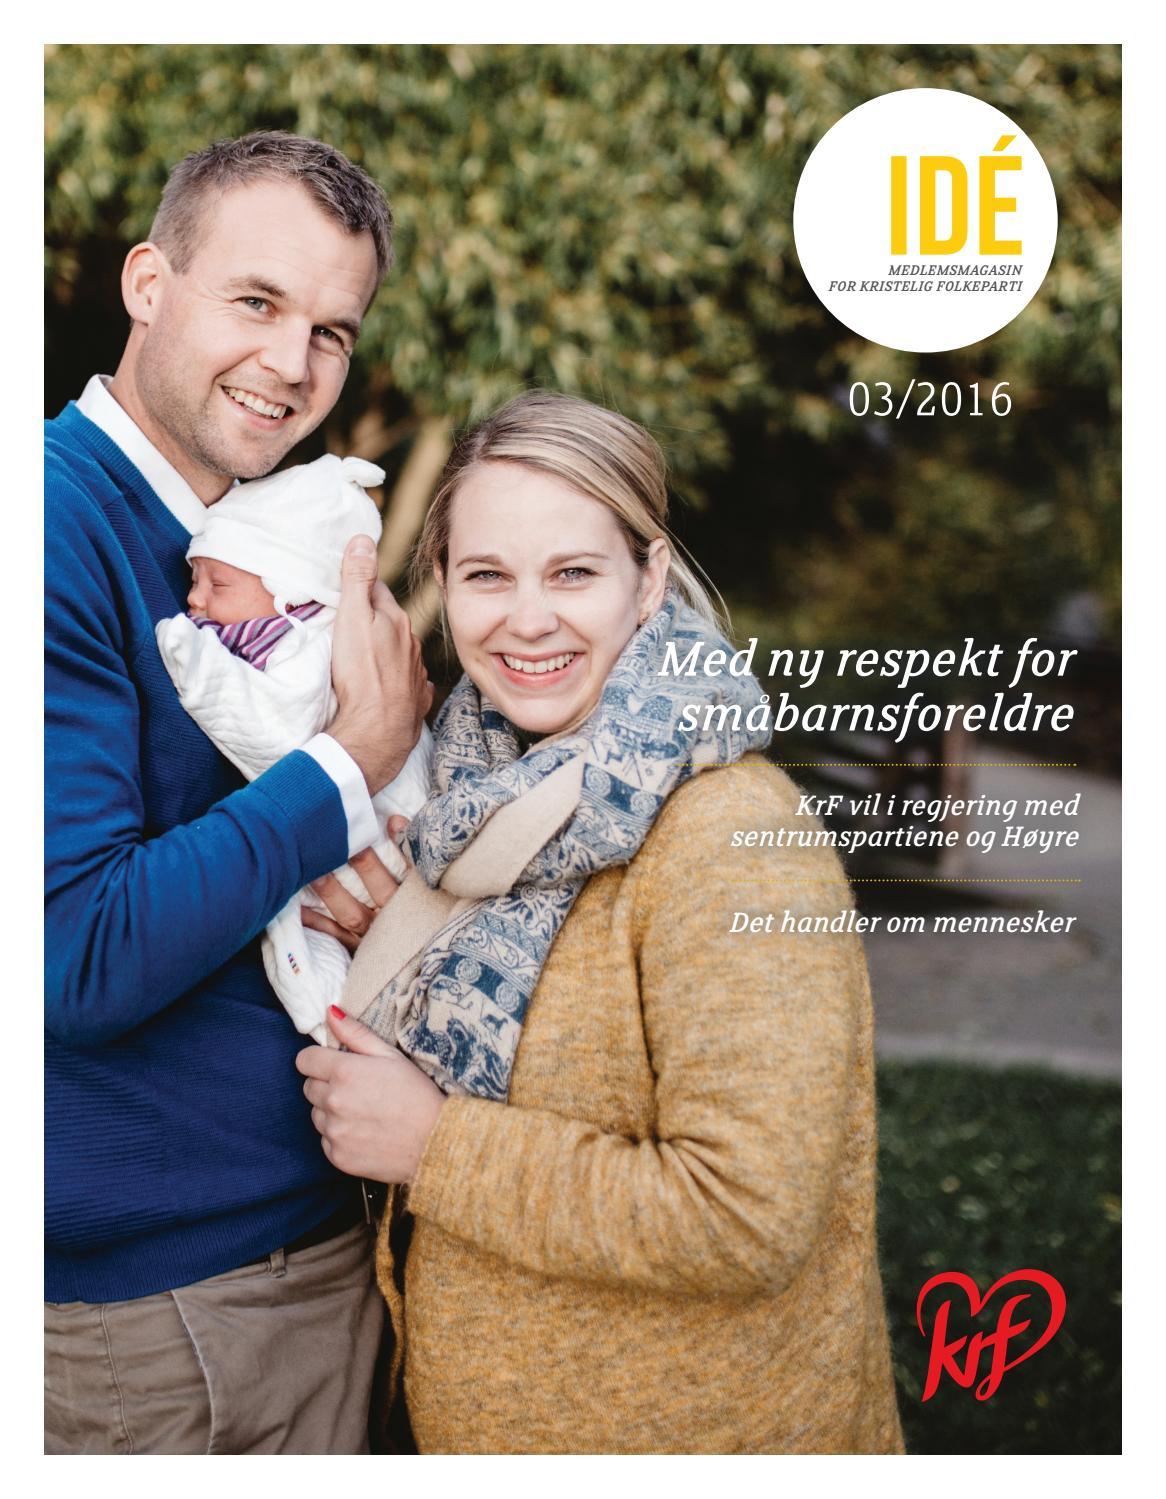 Idé 3, 2014 by kristelig folkeparti   issuu